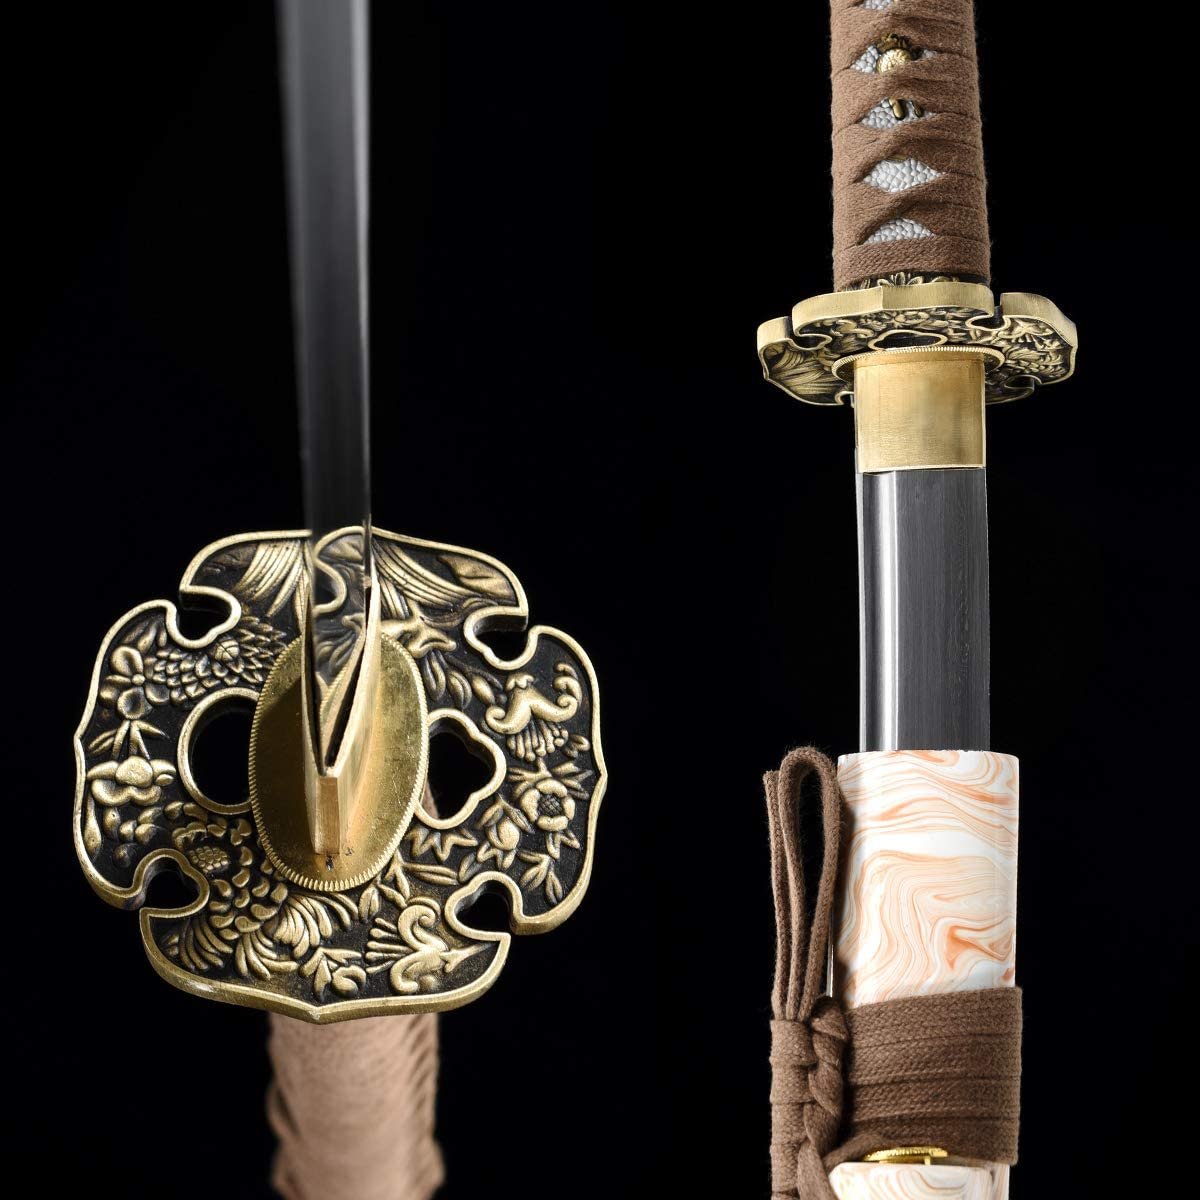 Amazon.com: Eeroton Damasco - Espada de acero forjado a mano ...